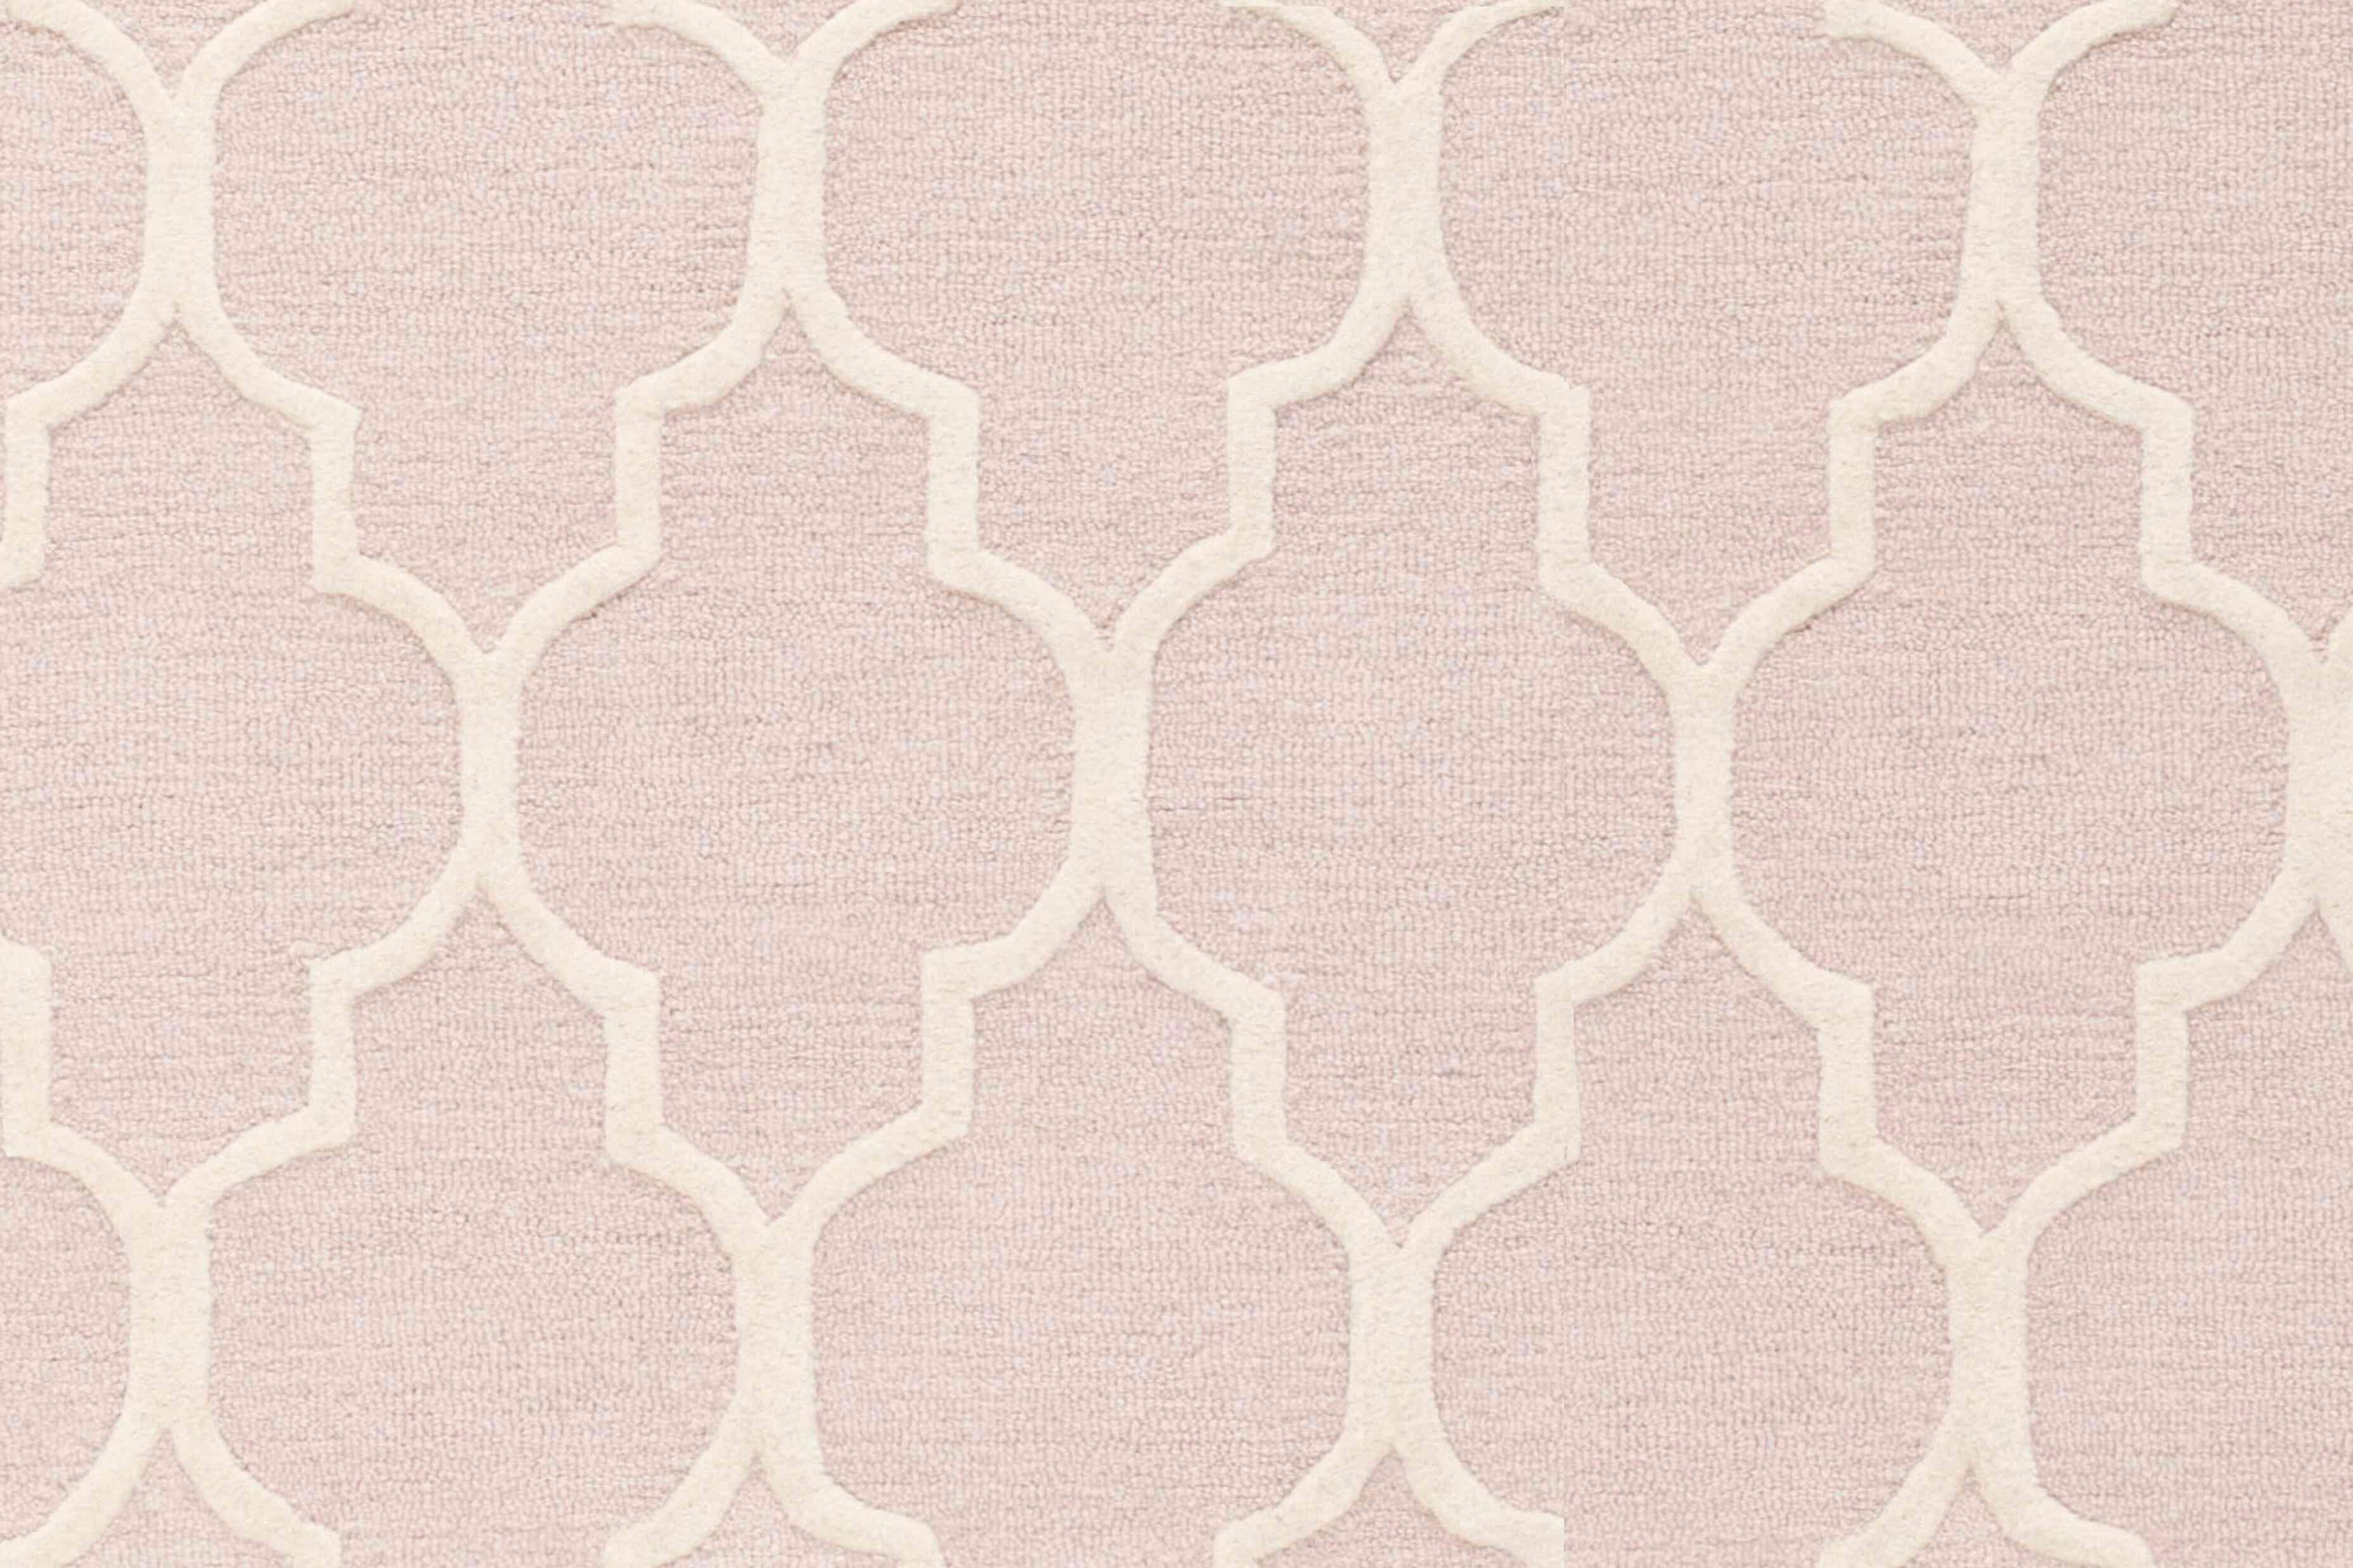 Moroccan lattice design